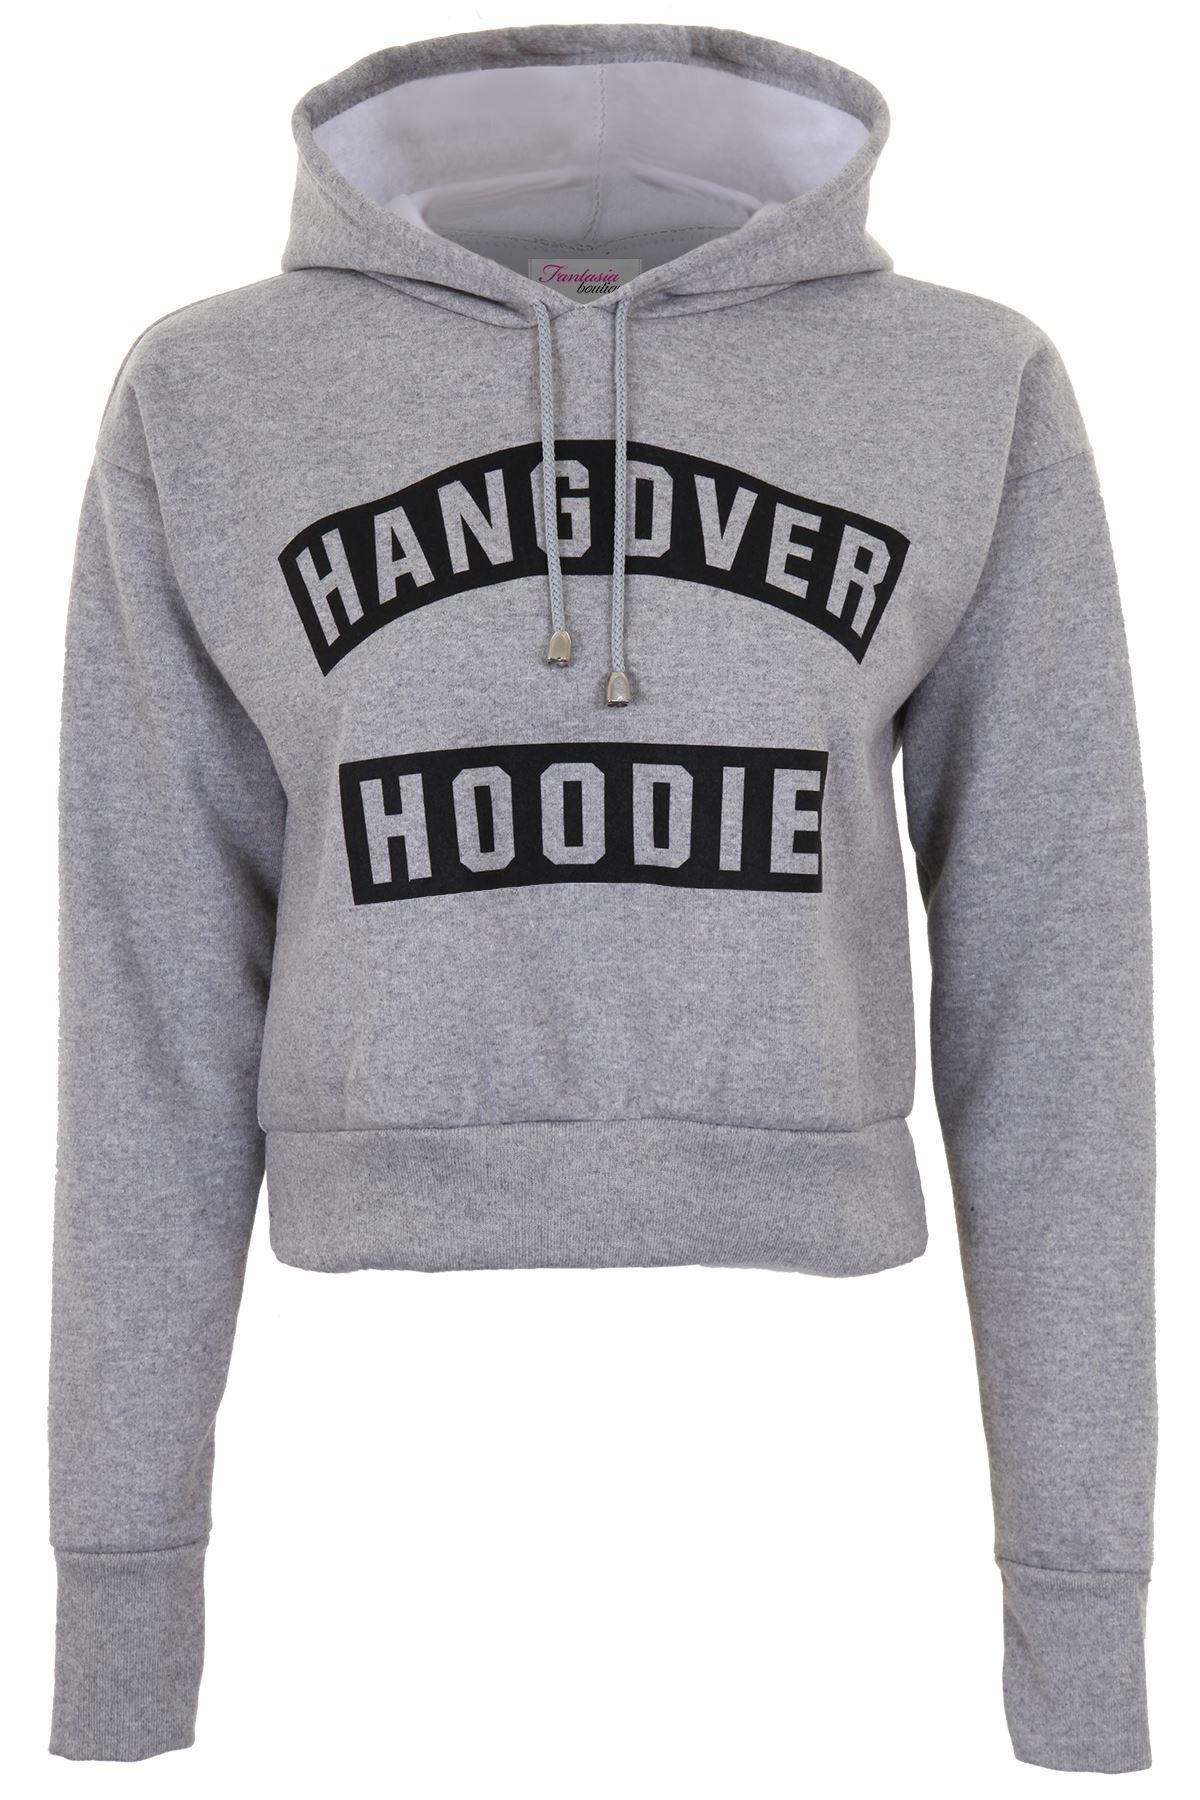 Hangover grey hoodie